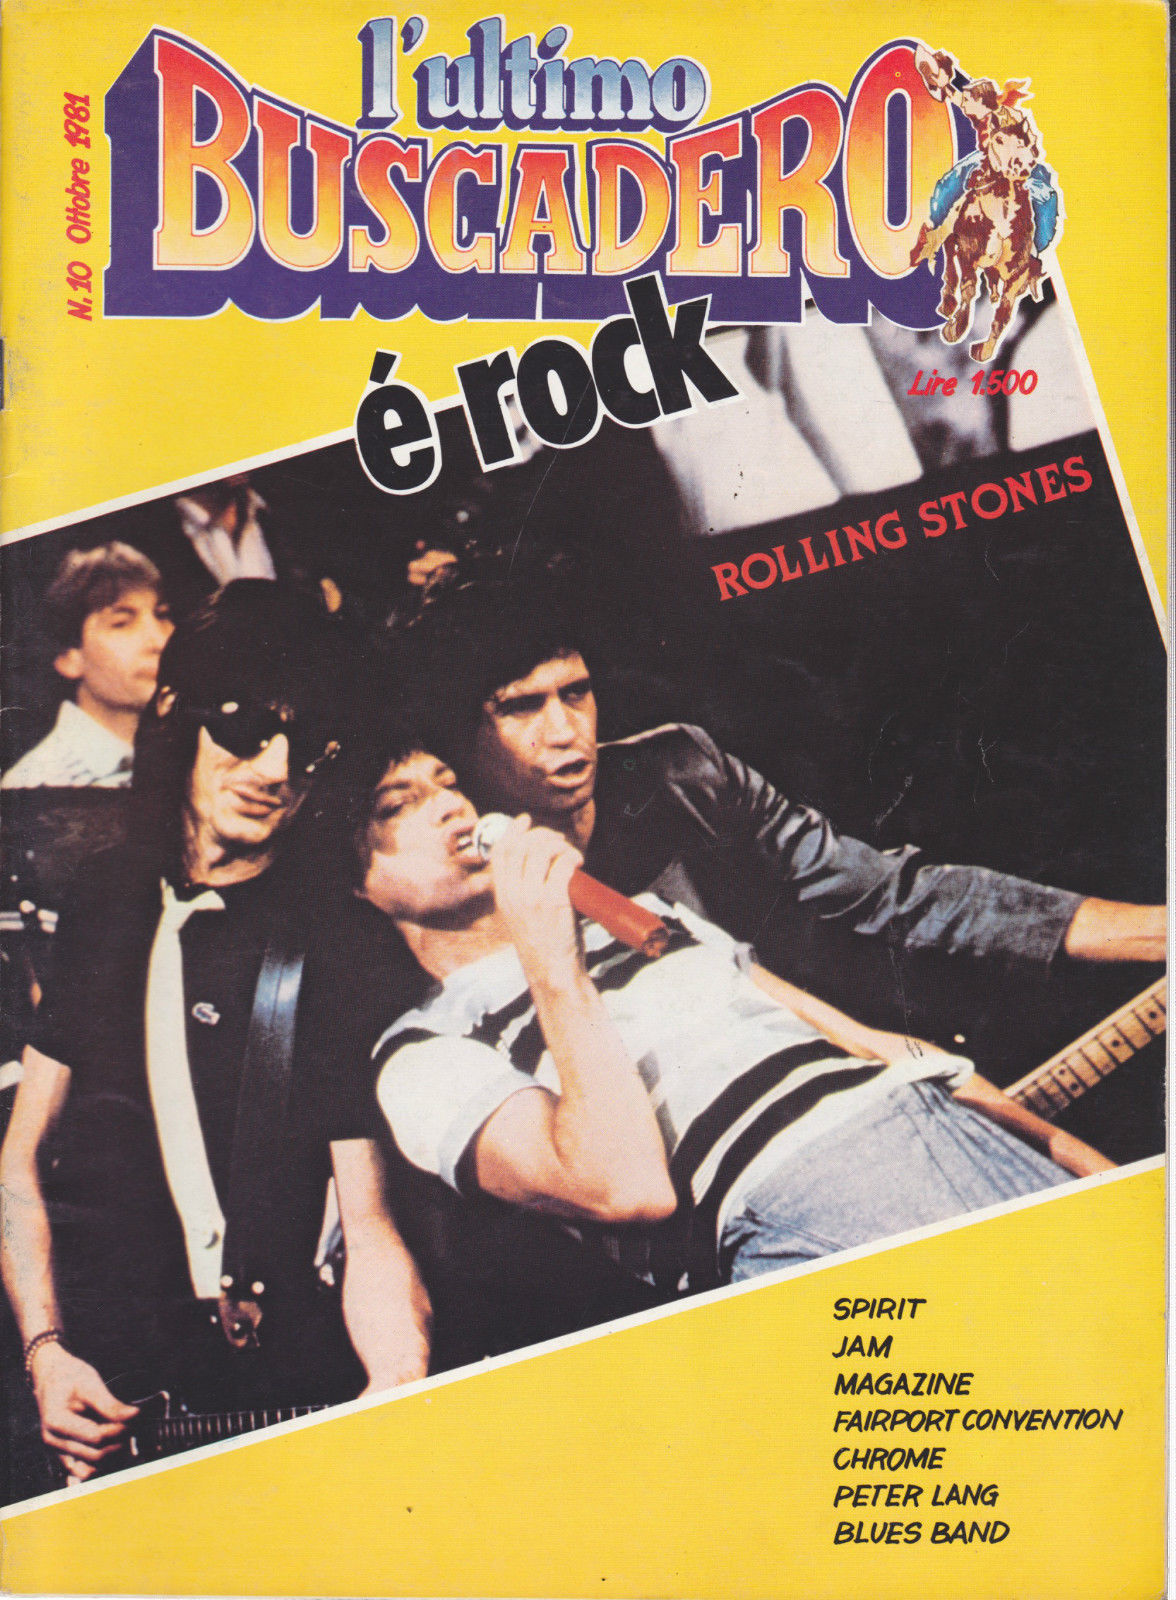 L'ultimo Buscadero n. 10 (ottobre 1981)